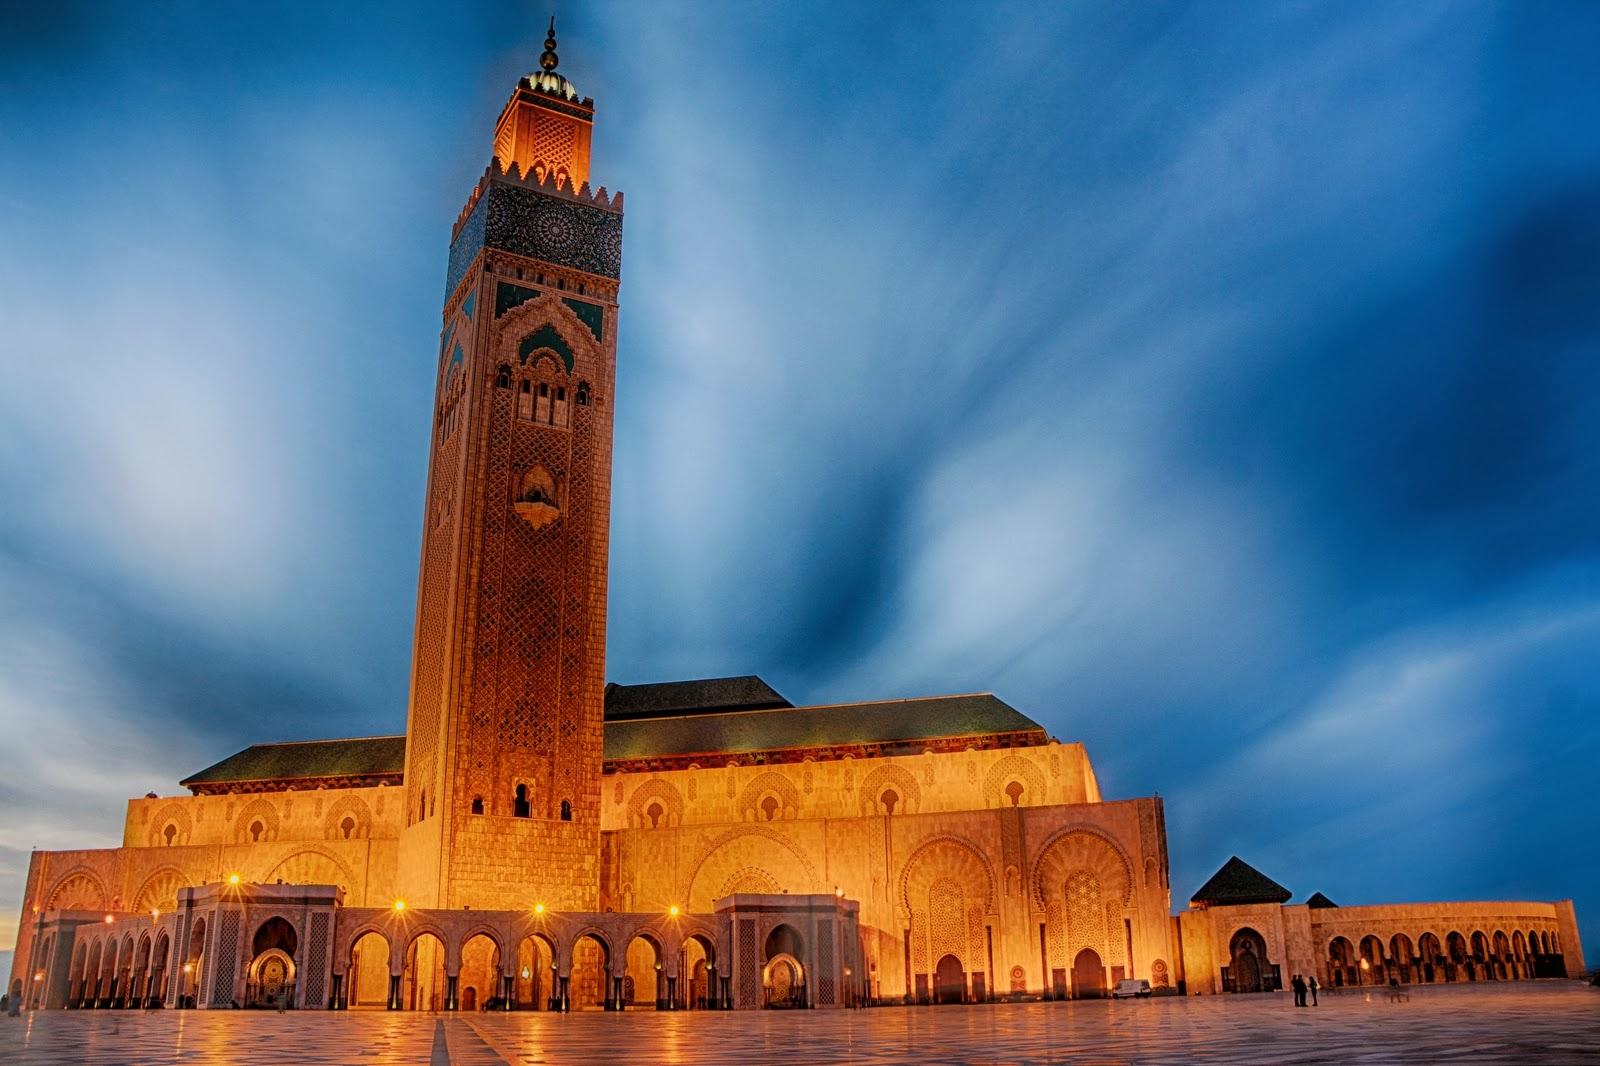 Mosqu e hassan 2 casablanca for Mosquee hassan 2 interieur